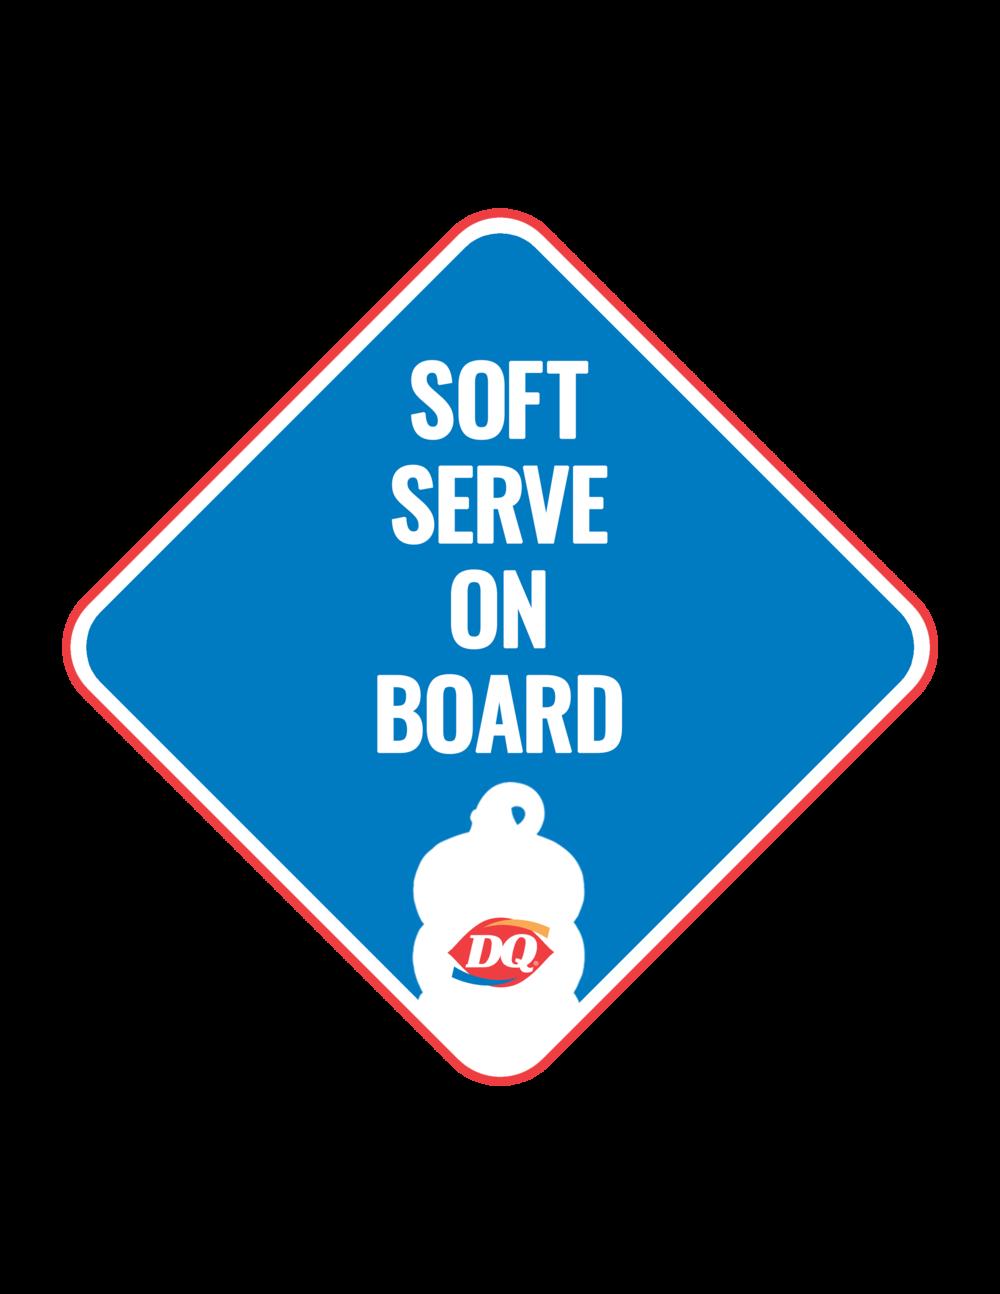 SoftServeOnBoardsign.png